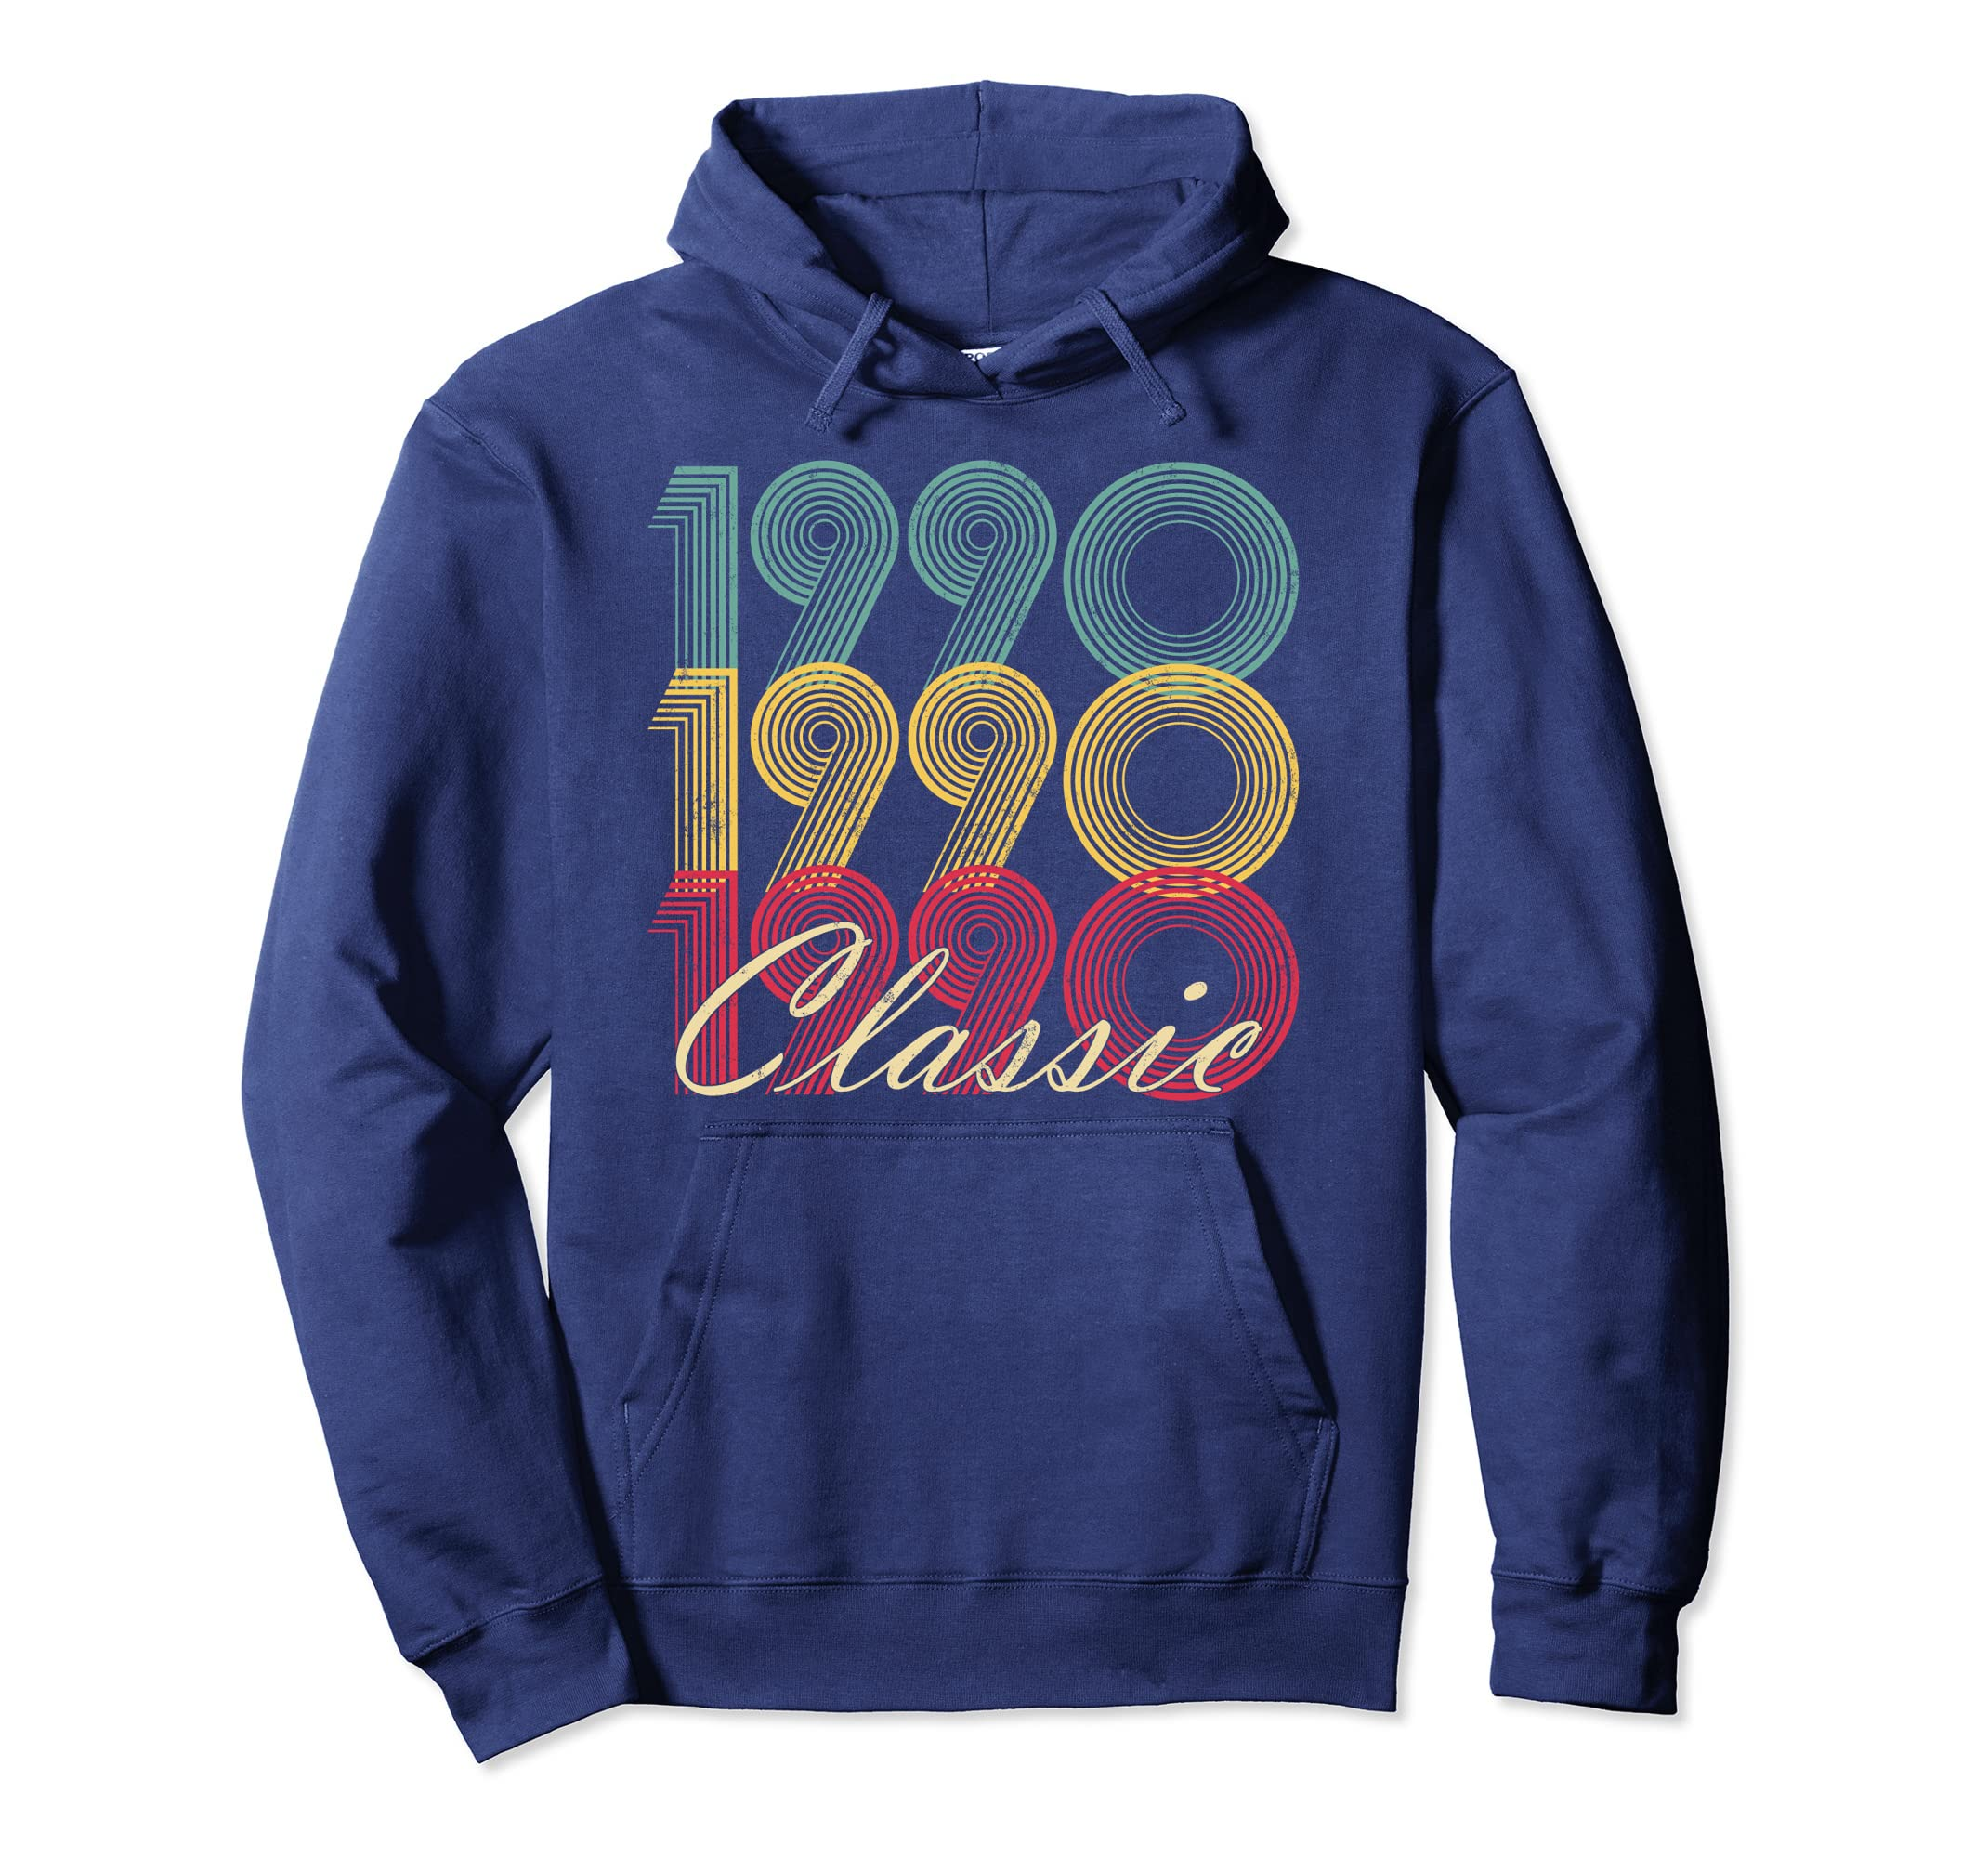 Classic 1990 28th Birthday Vintage Hoodie Retro 28 Son Gift-Colonhue